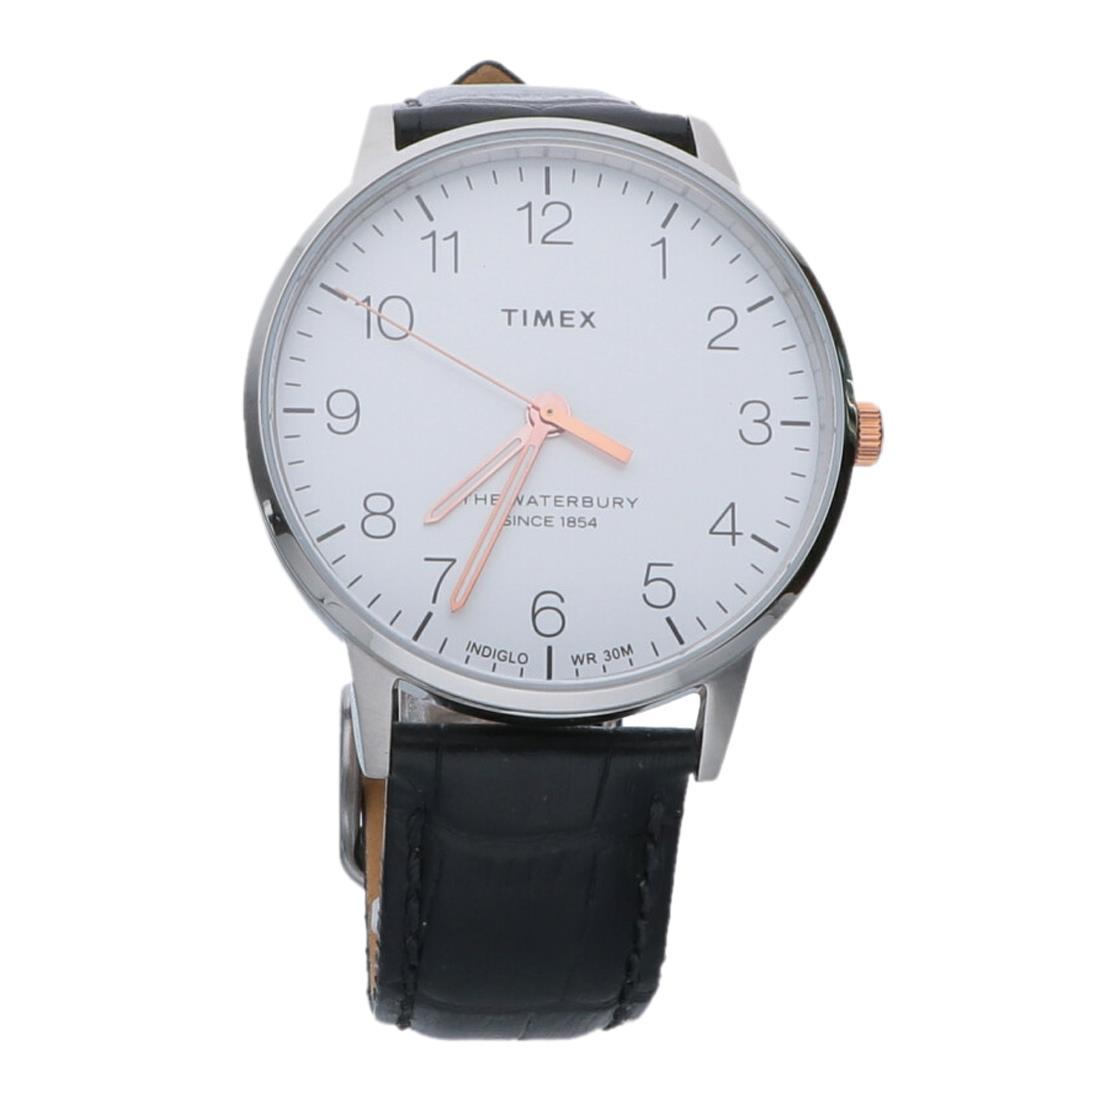 Orologio cassa 40 mm - TIMEX